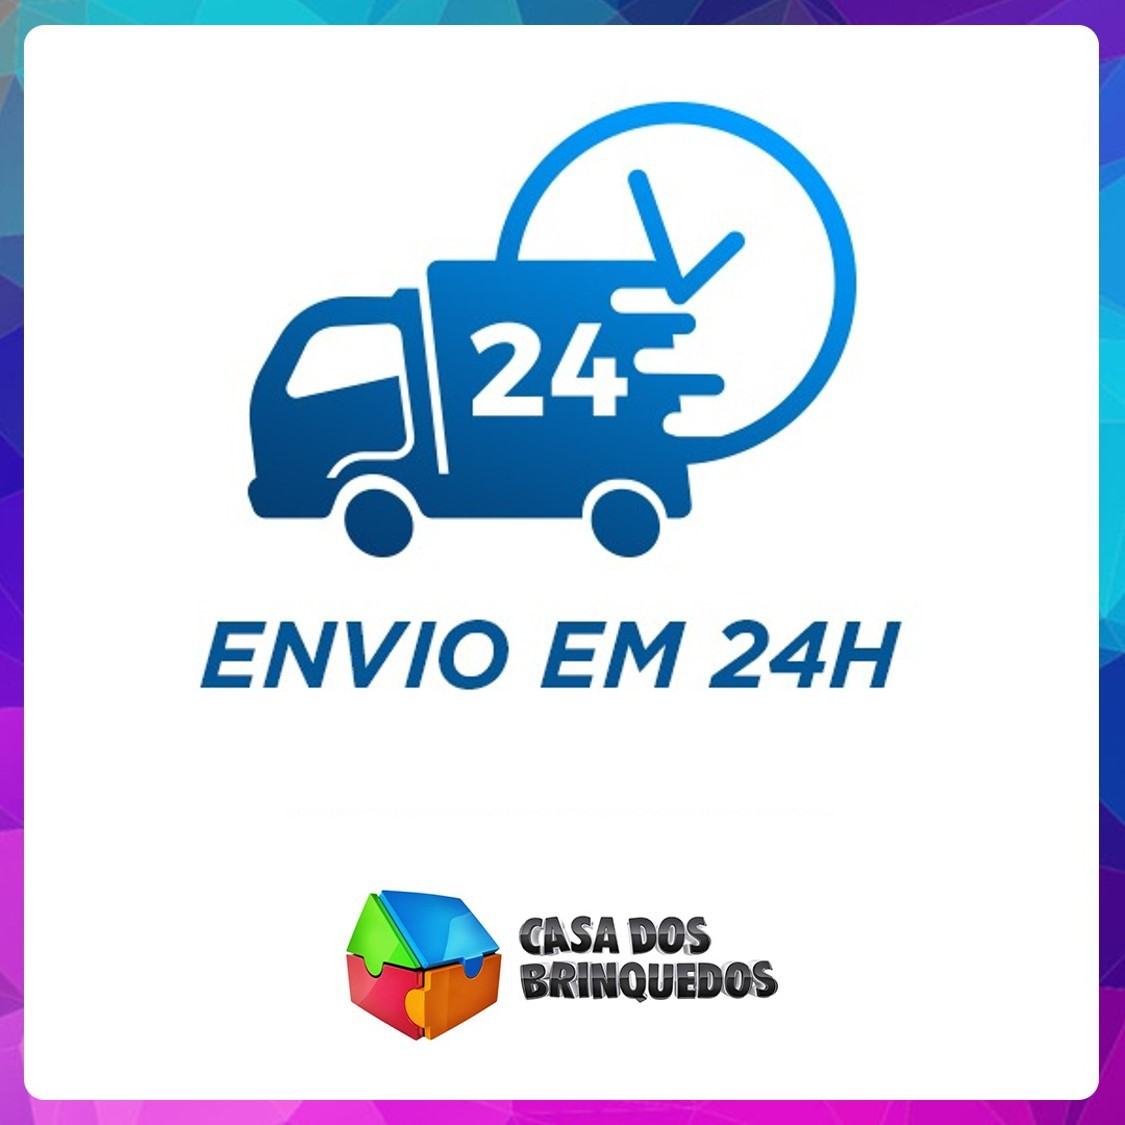 BONECO CAPITÃ MARVEL AVENGERS BLAST GEAR 30CM E7875 HASBRO